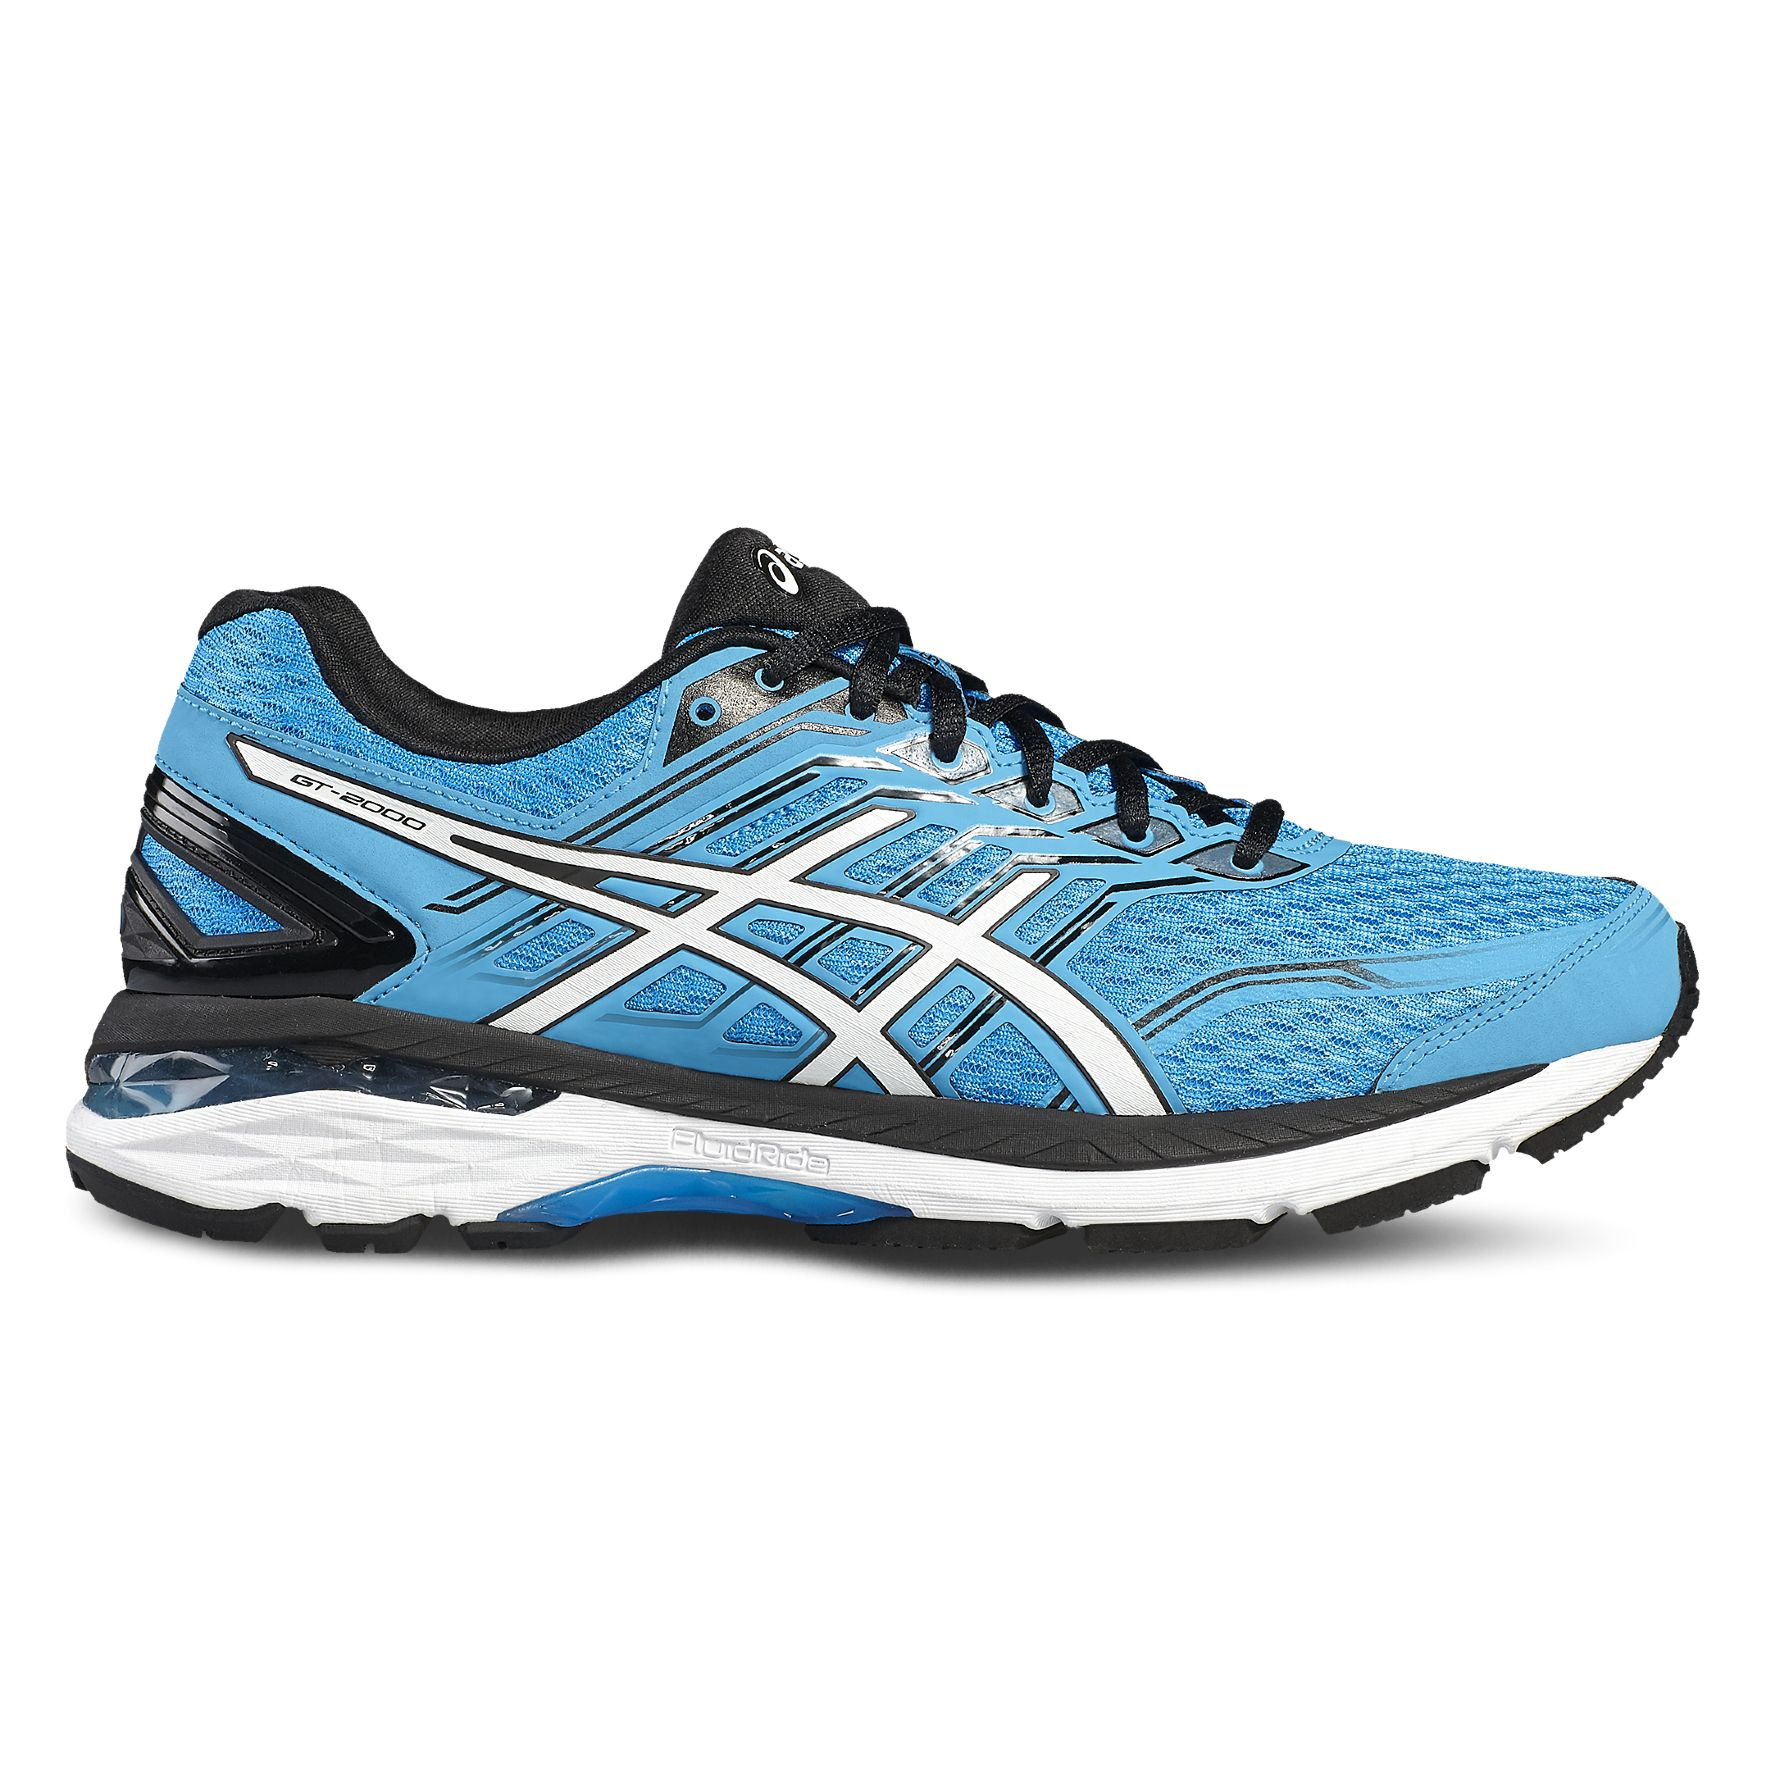 asics gt 2000 5 mens running shoes